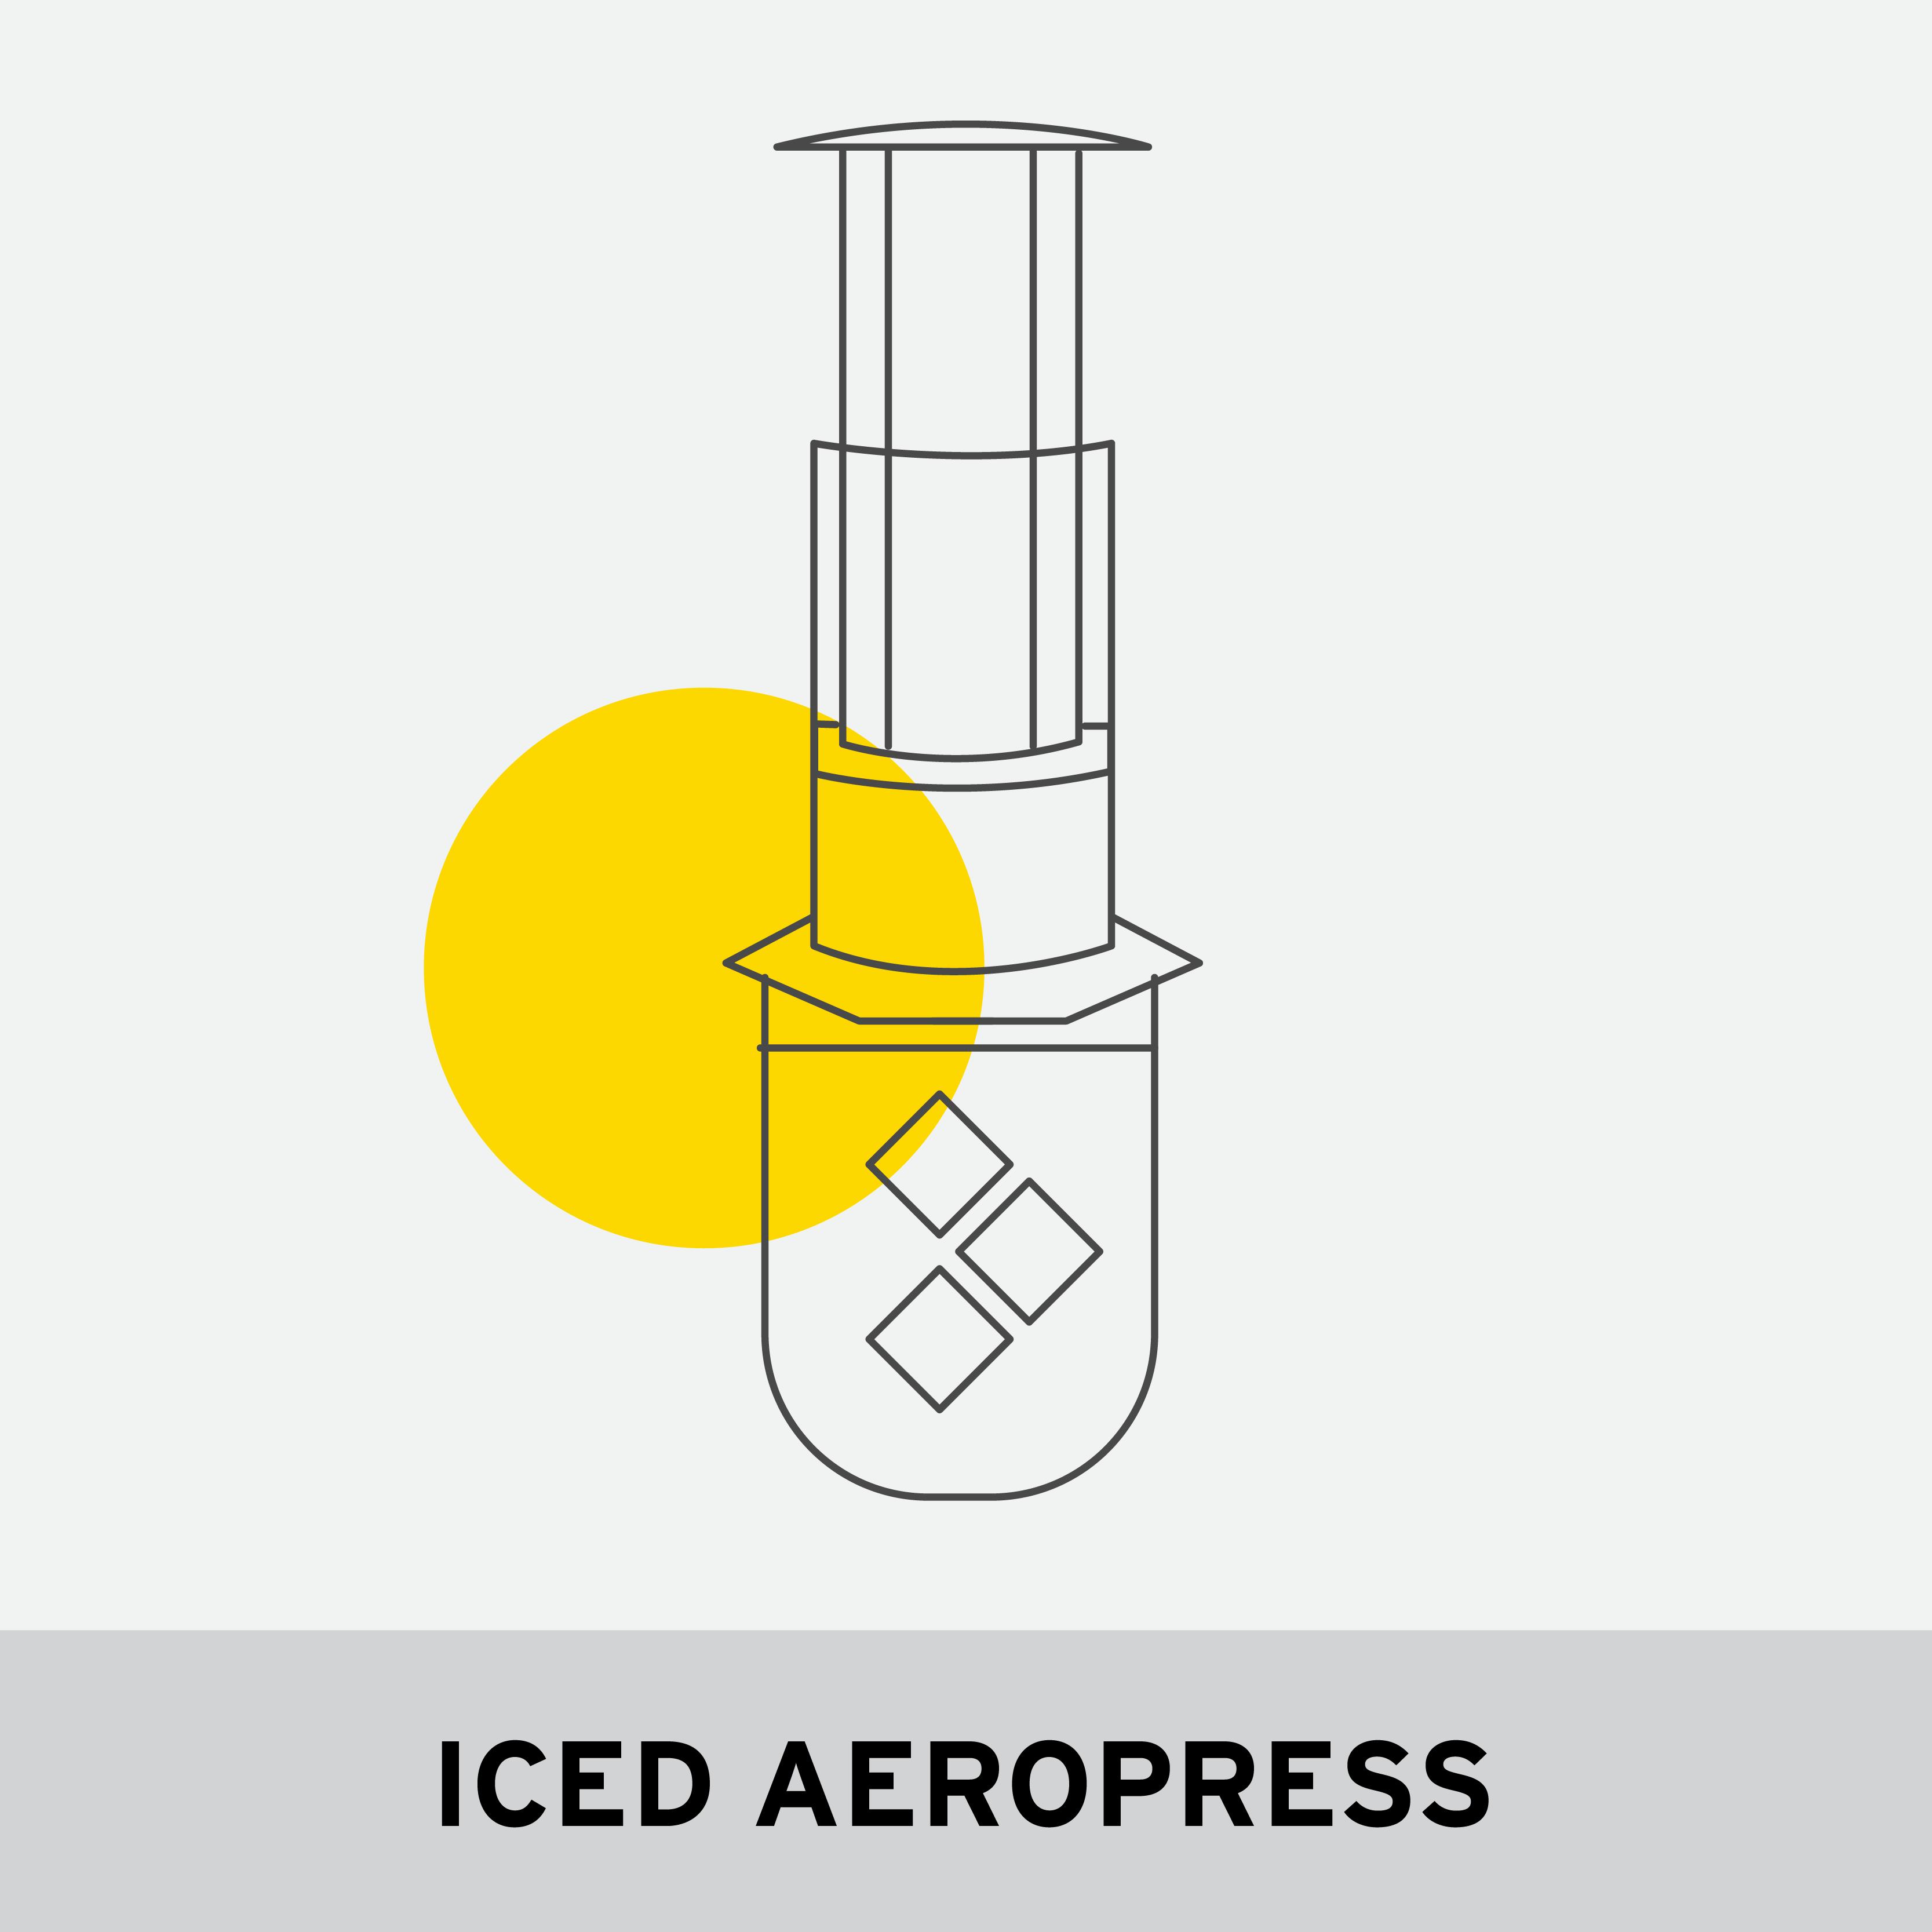 ICED AEROPRESS